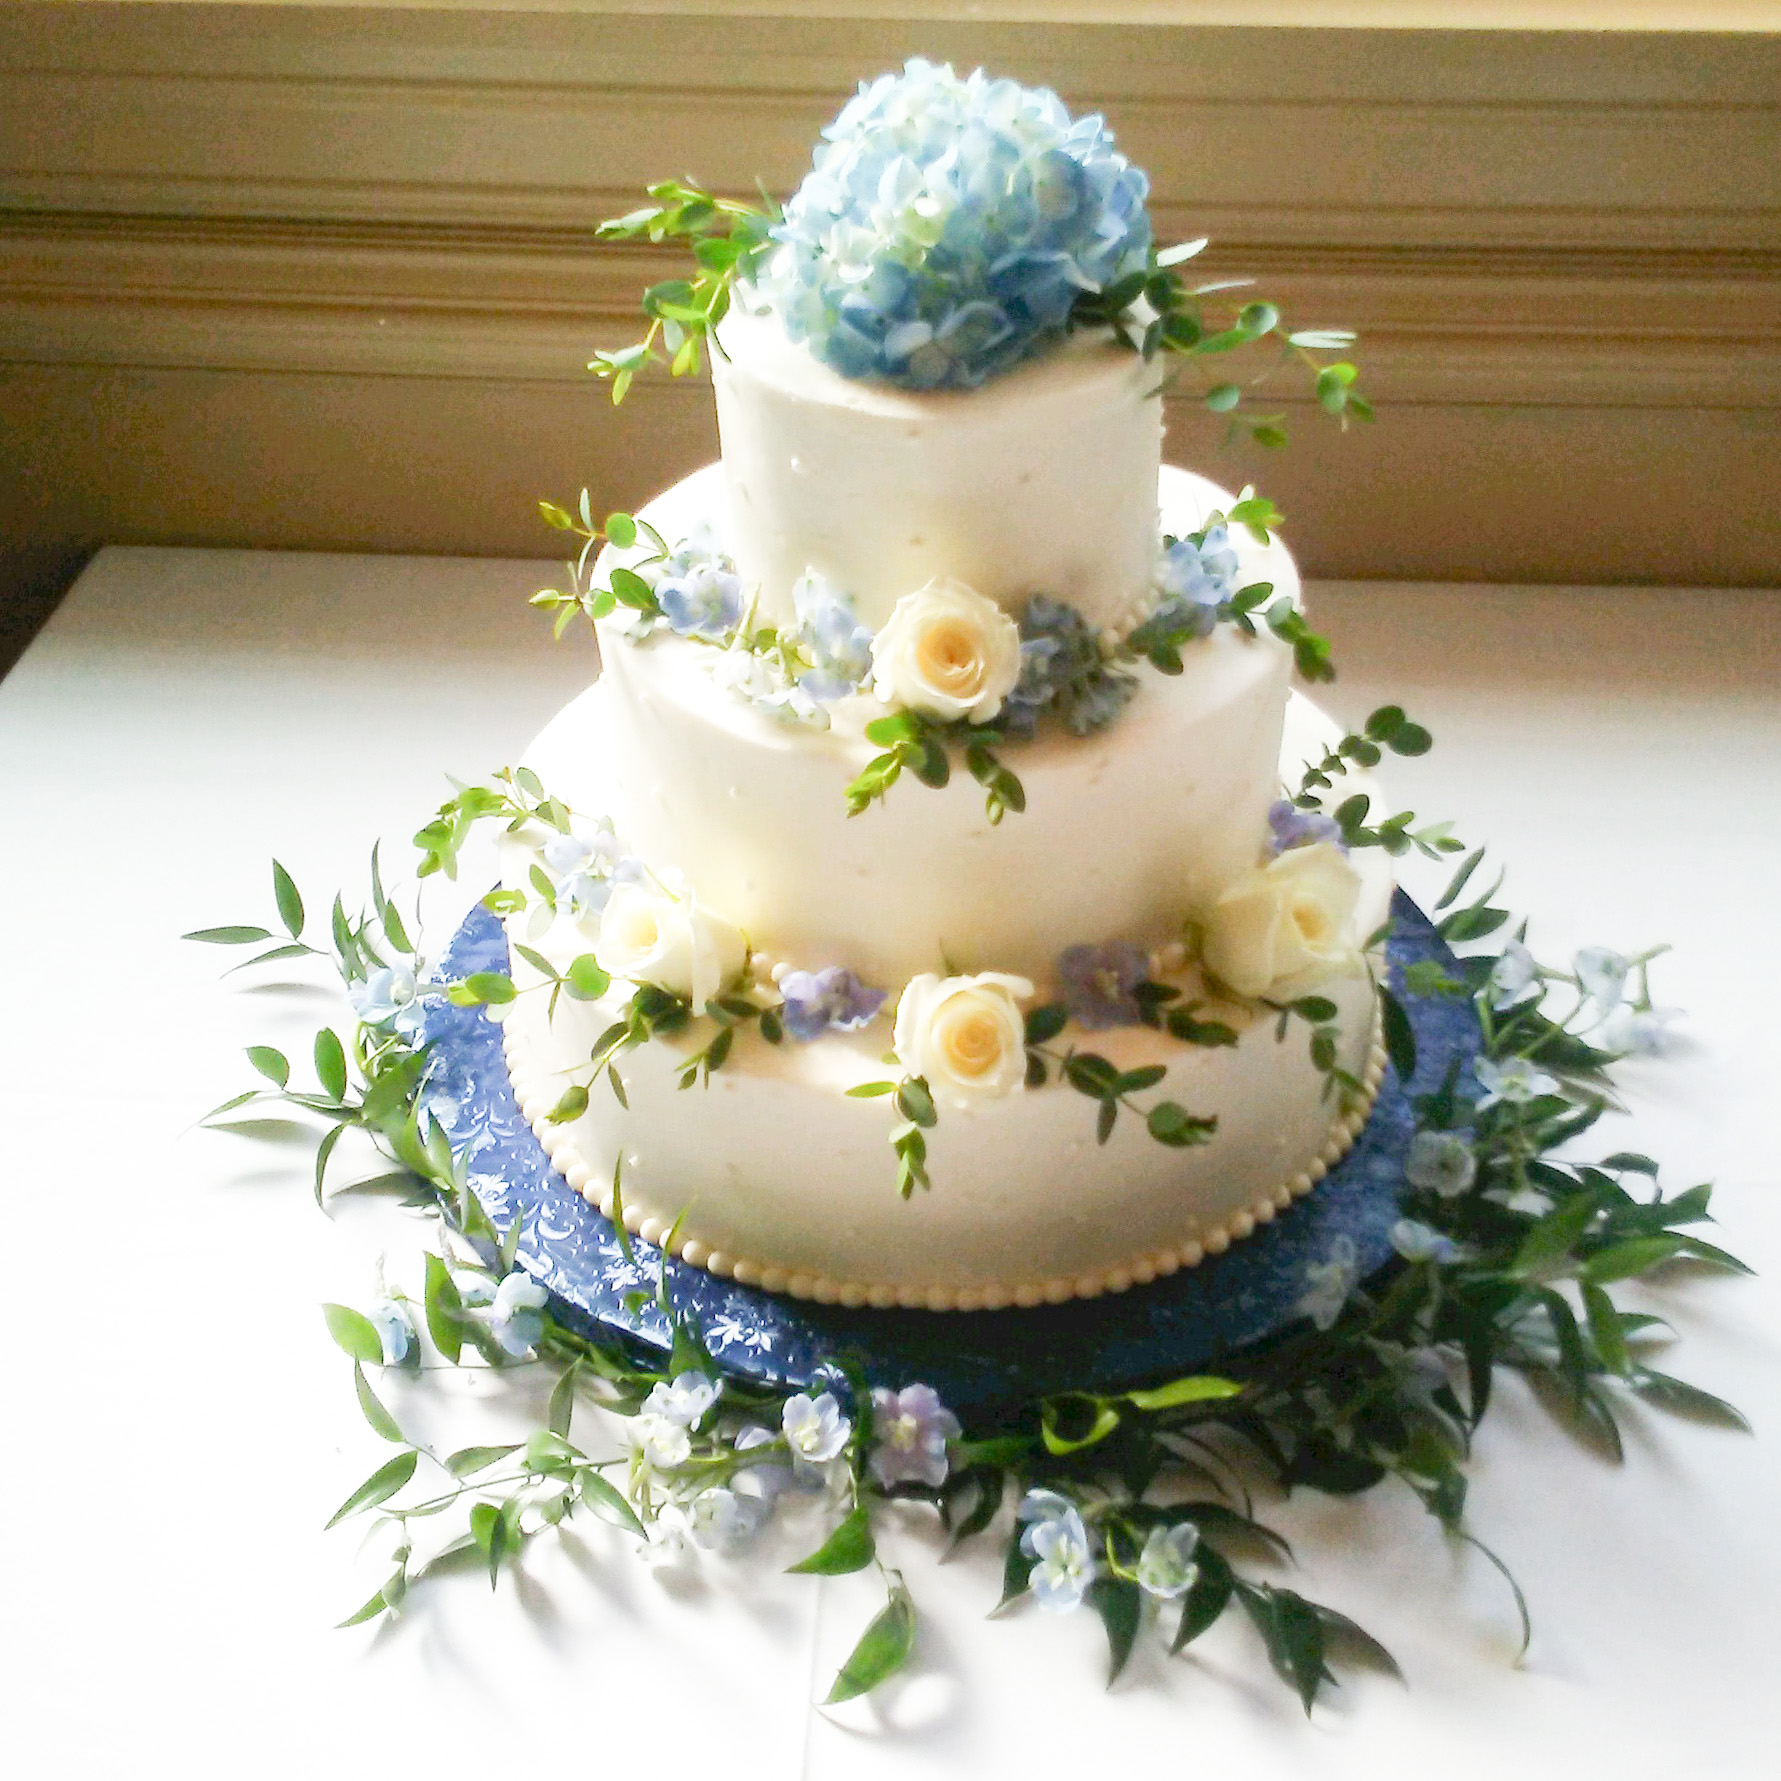 HFL_Summer blues02 cake